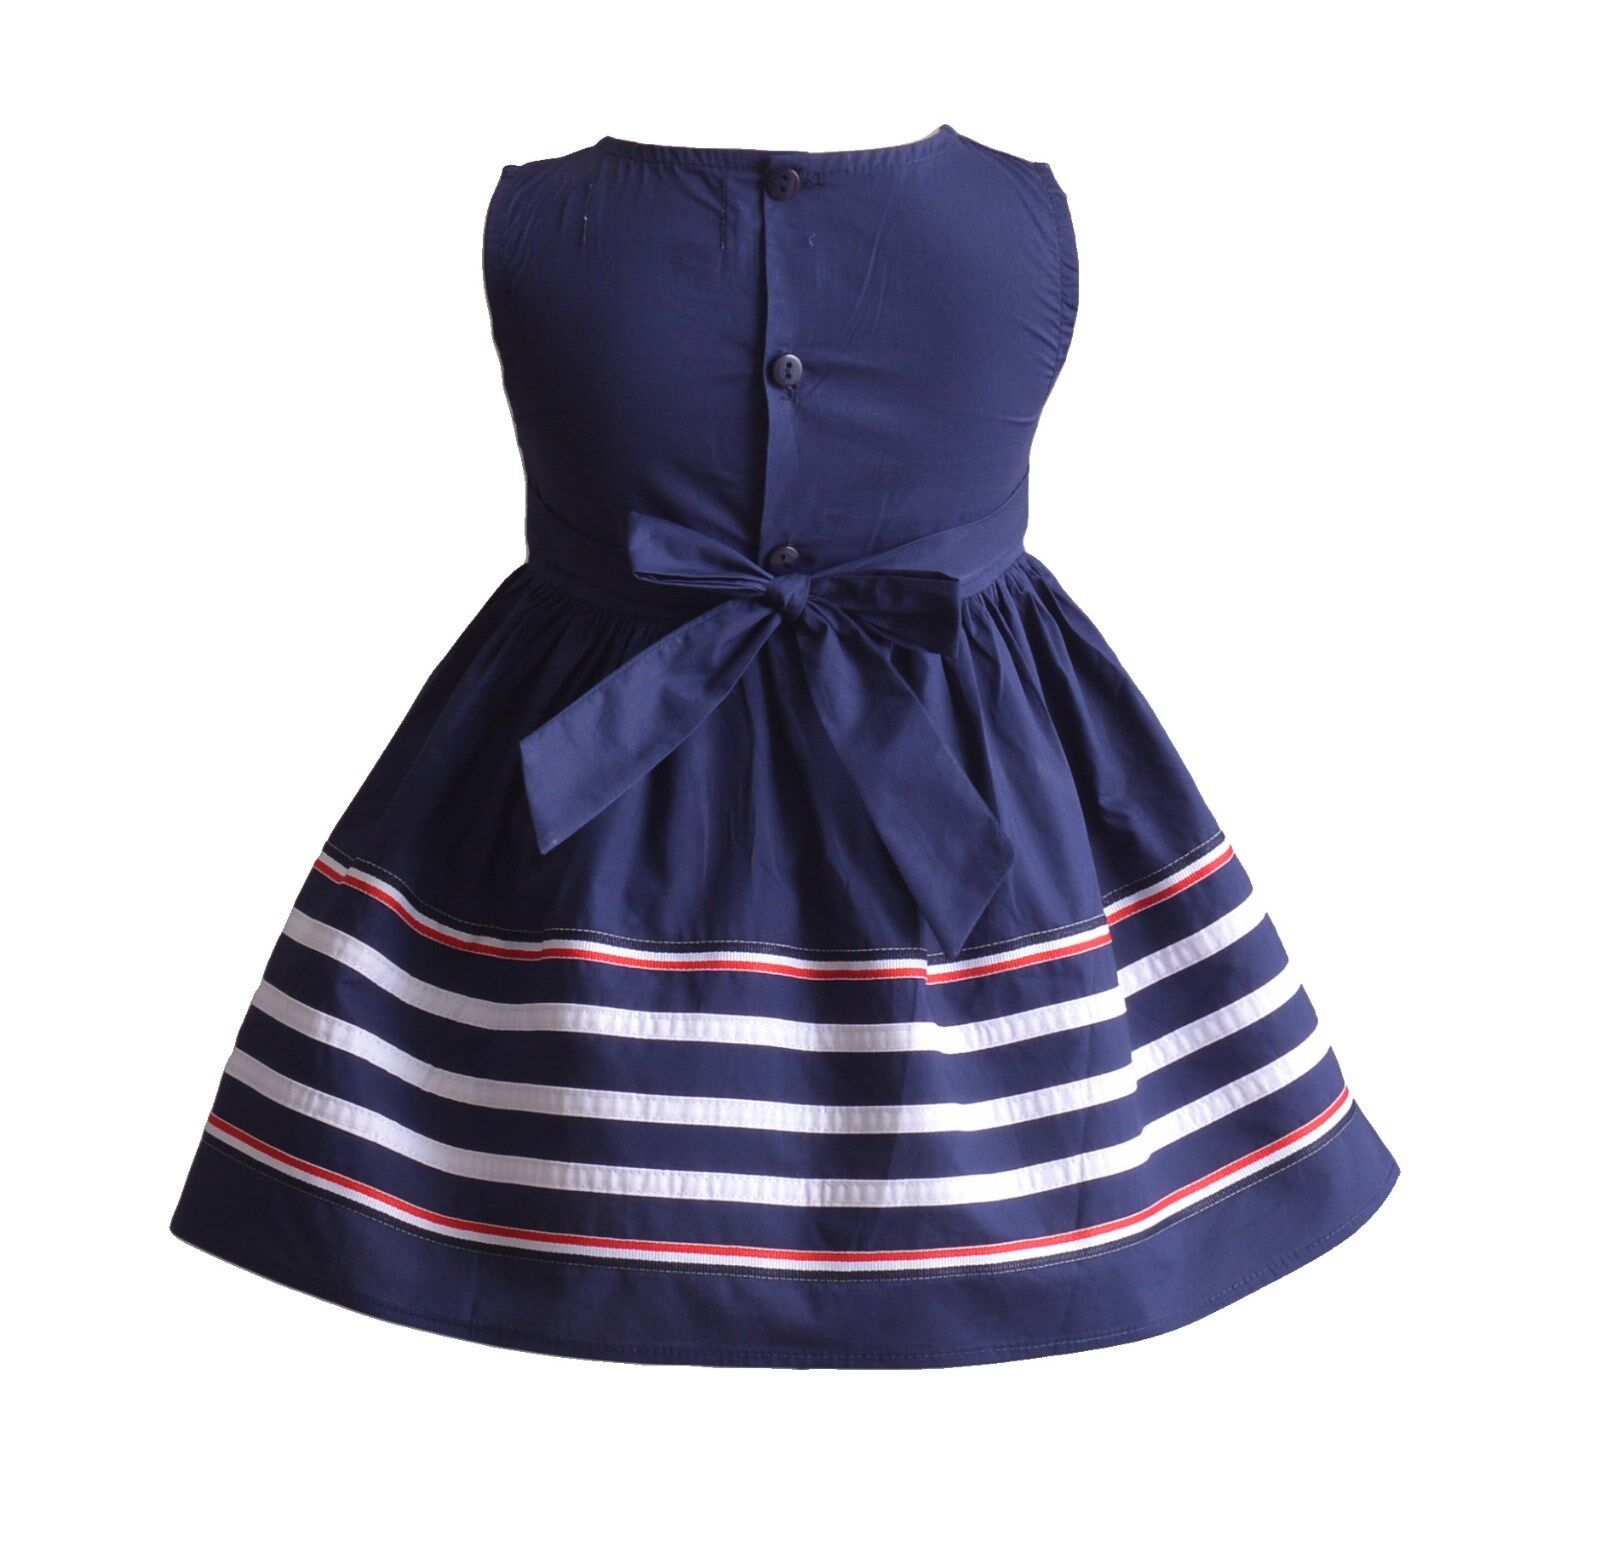 d94d005ac Cinda Baby Girls Red Striped Cotton Summer Party Dress 12-18 Months ...